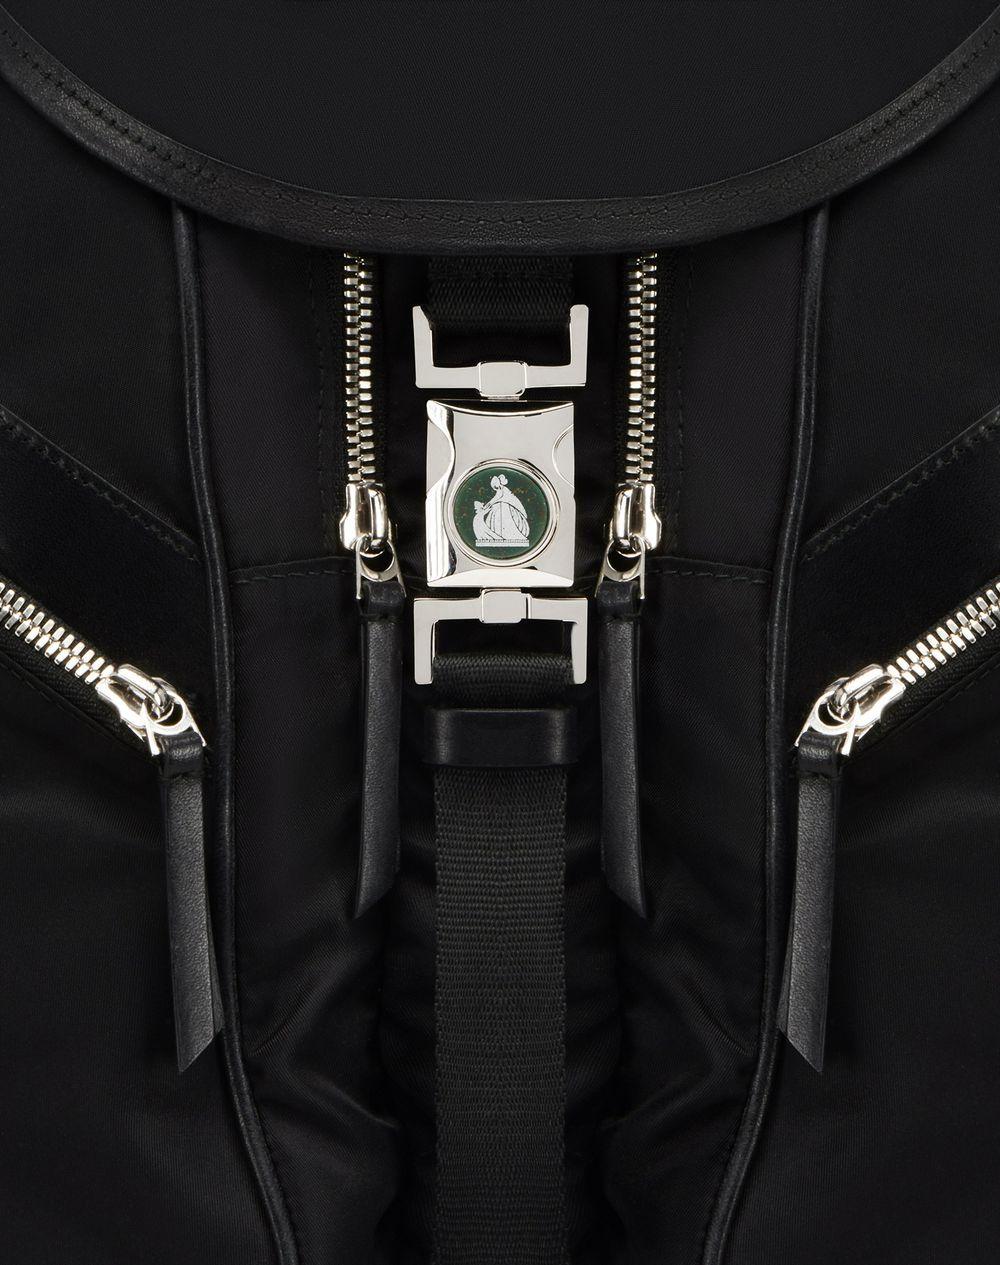 BLACK VENICE RUCKSACK - Lanvin